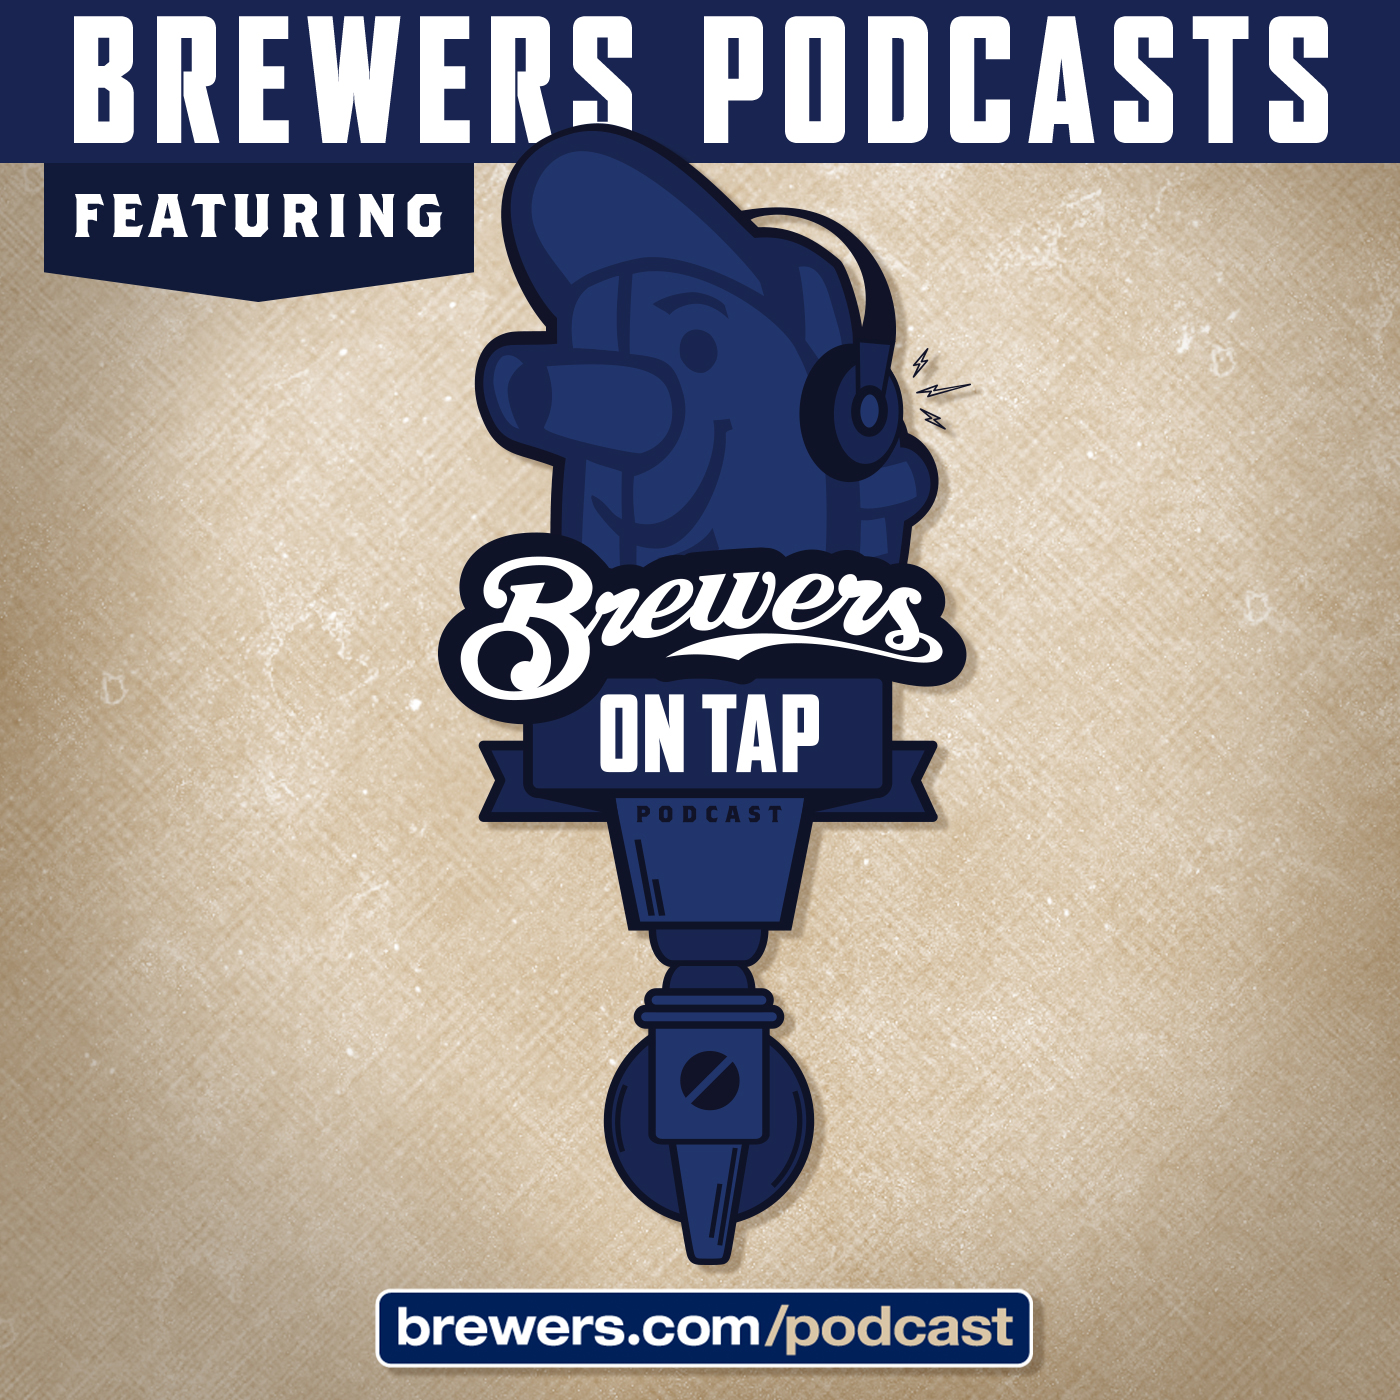 <![CDATA[Milwaukee Brewers Podcast]]>